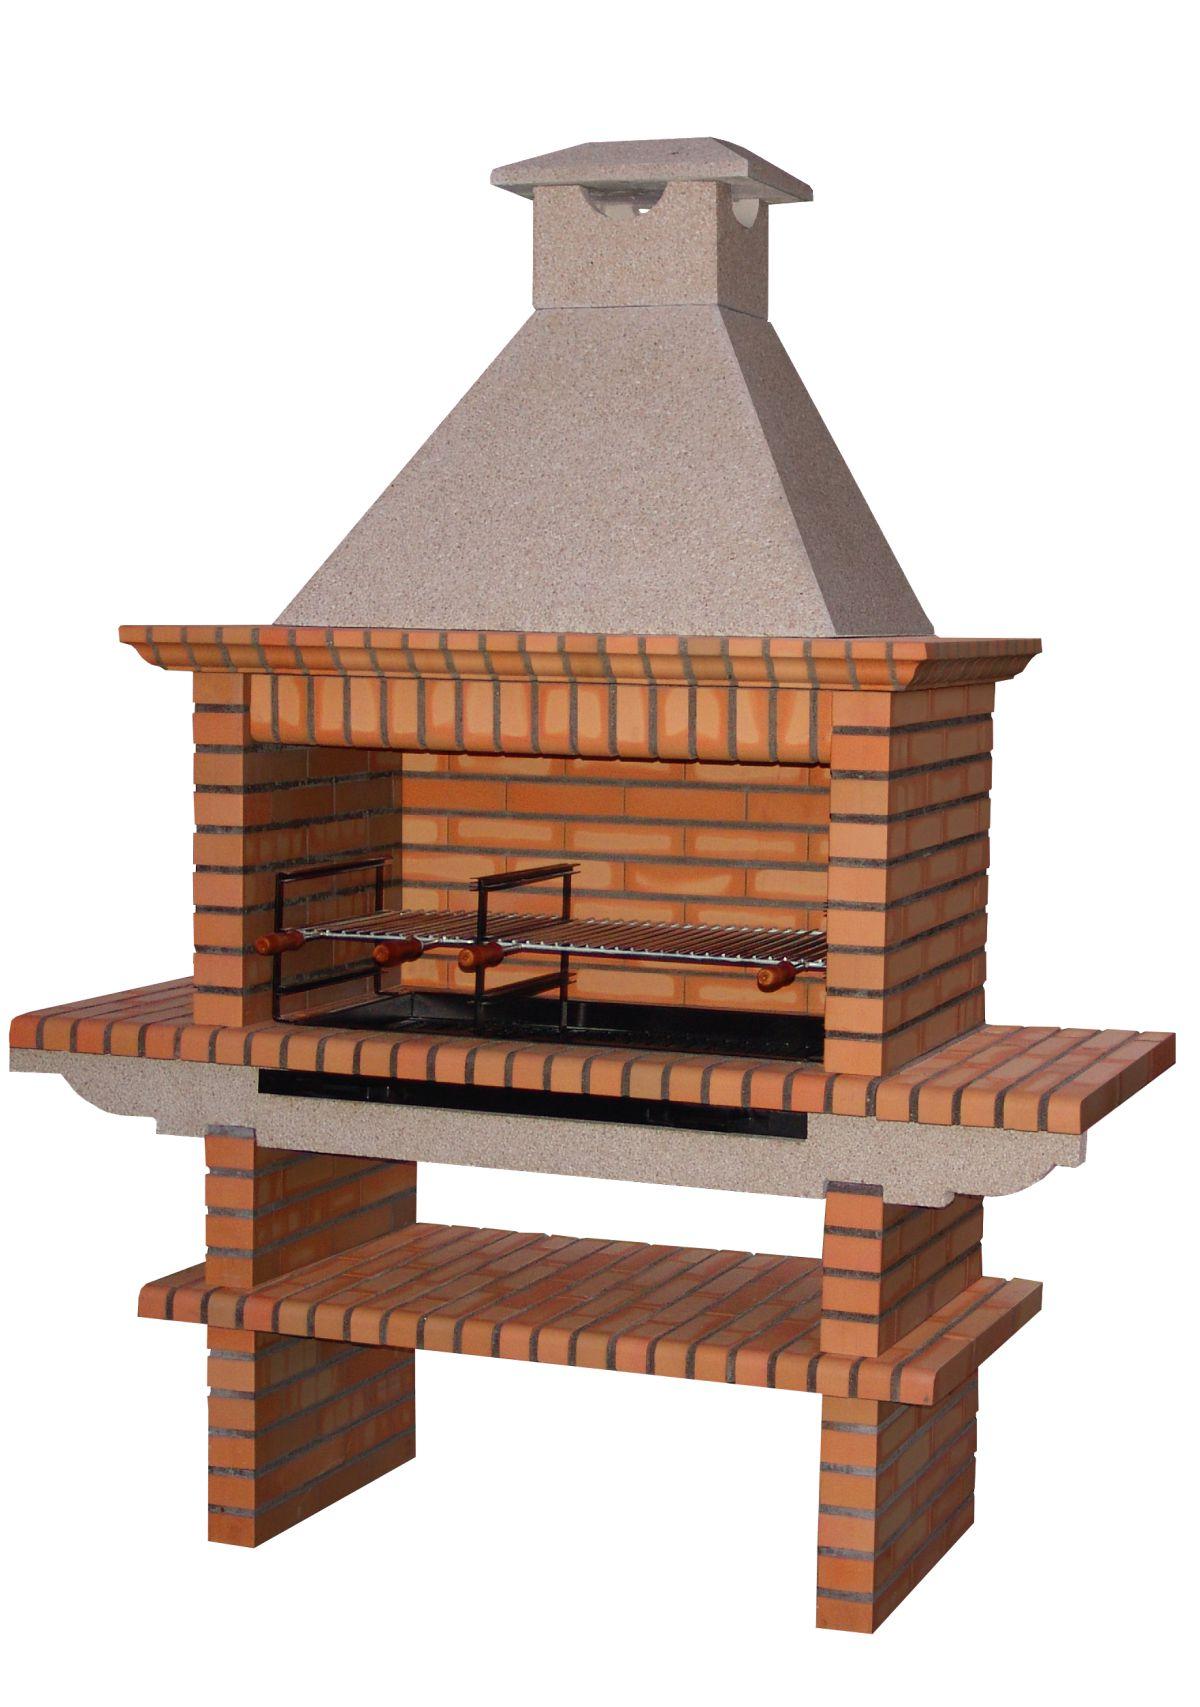 kit barbecue fixe en brique av1900f fours id du produit 600001080002. Black Bedroom Furniture Sets. Home Design Ideas